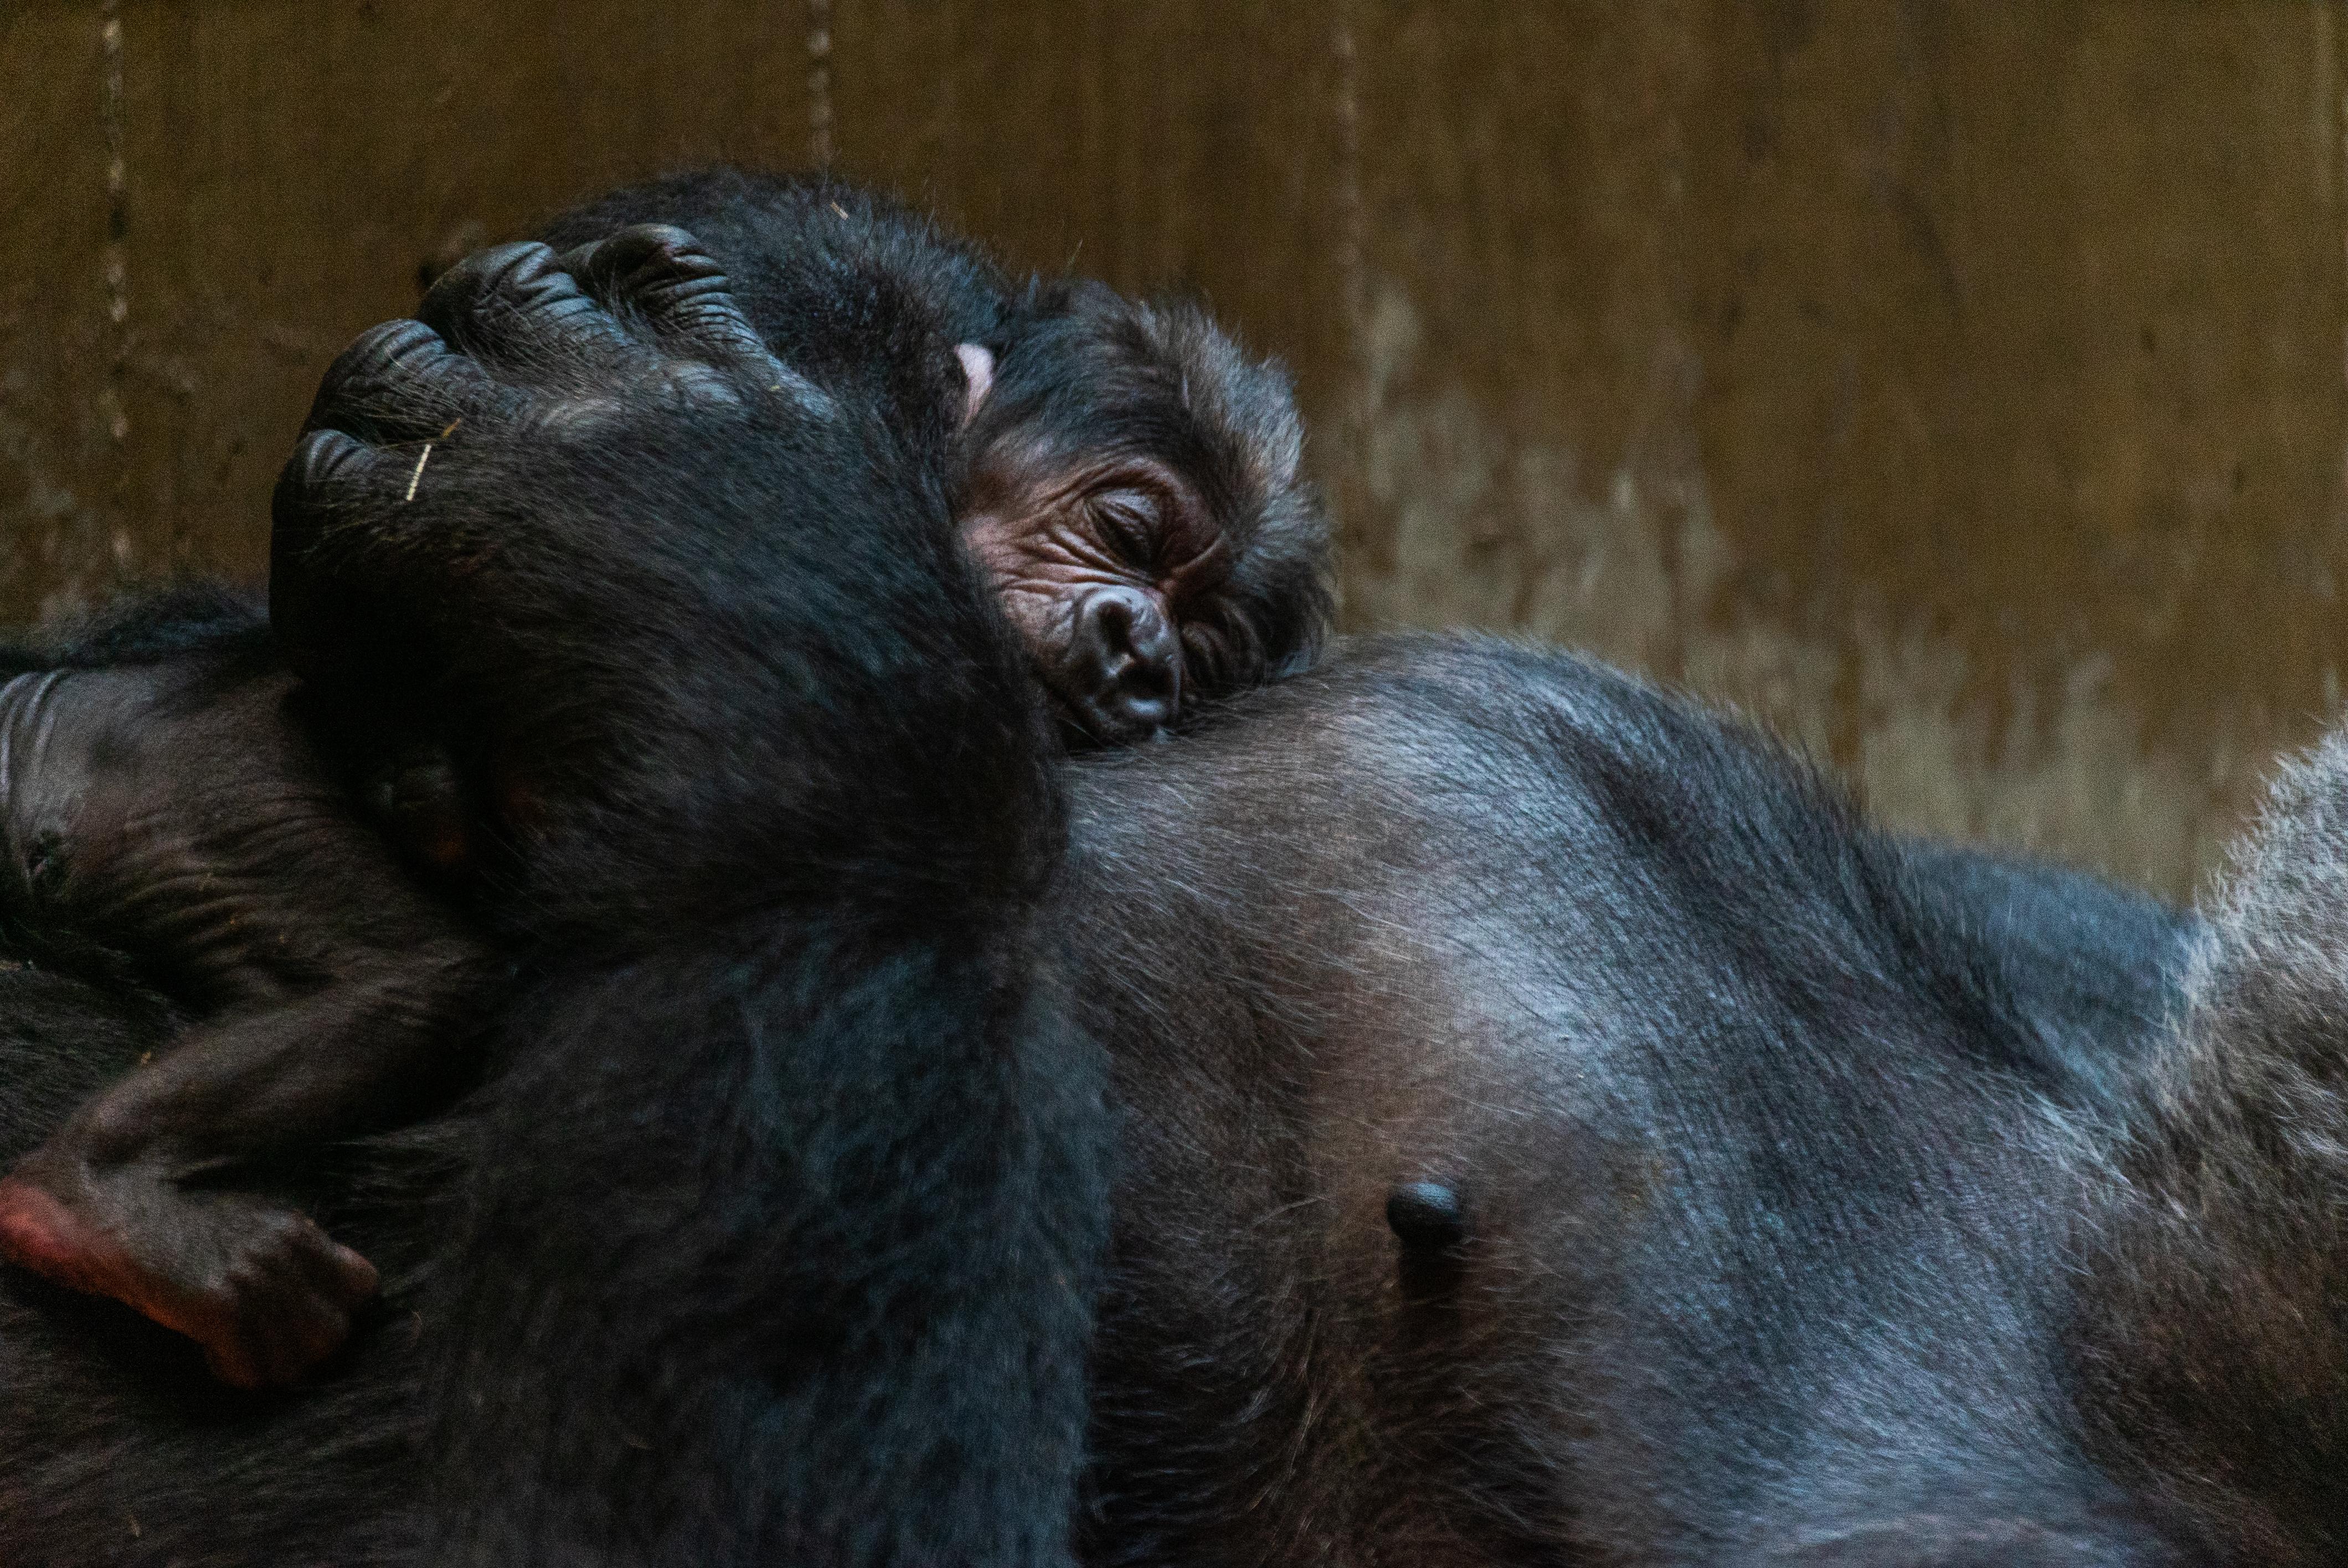 Smithsonian National Zoo Gorillas